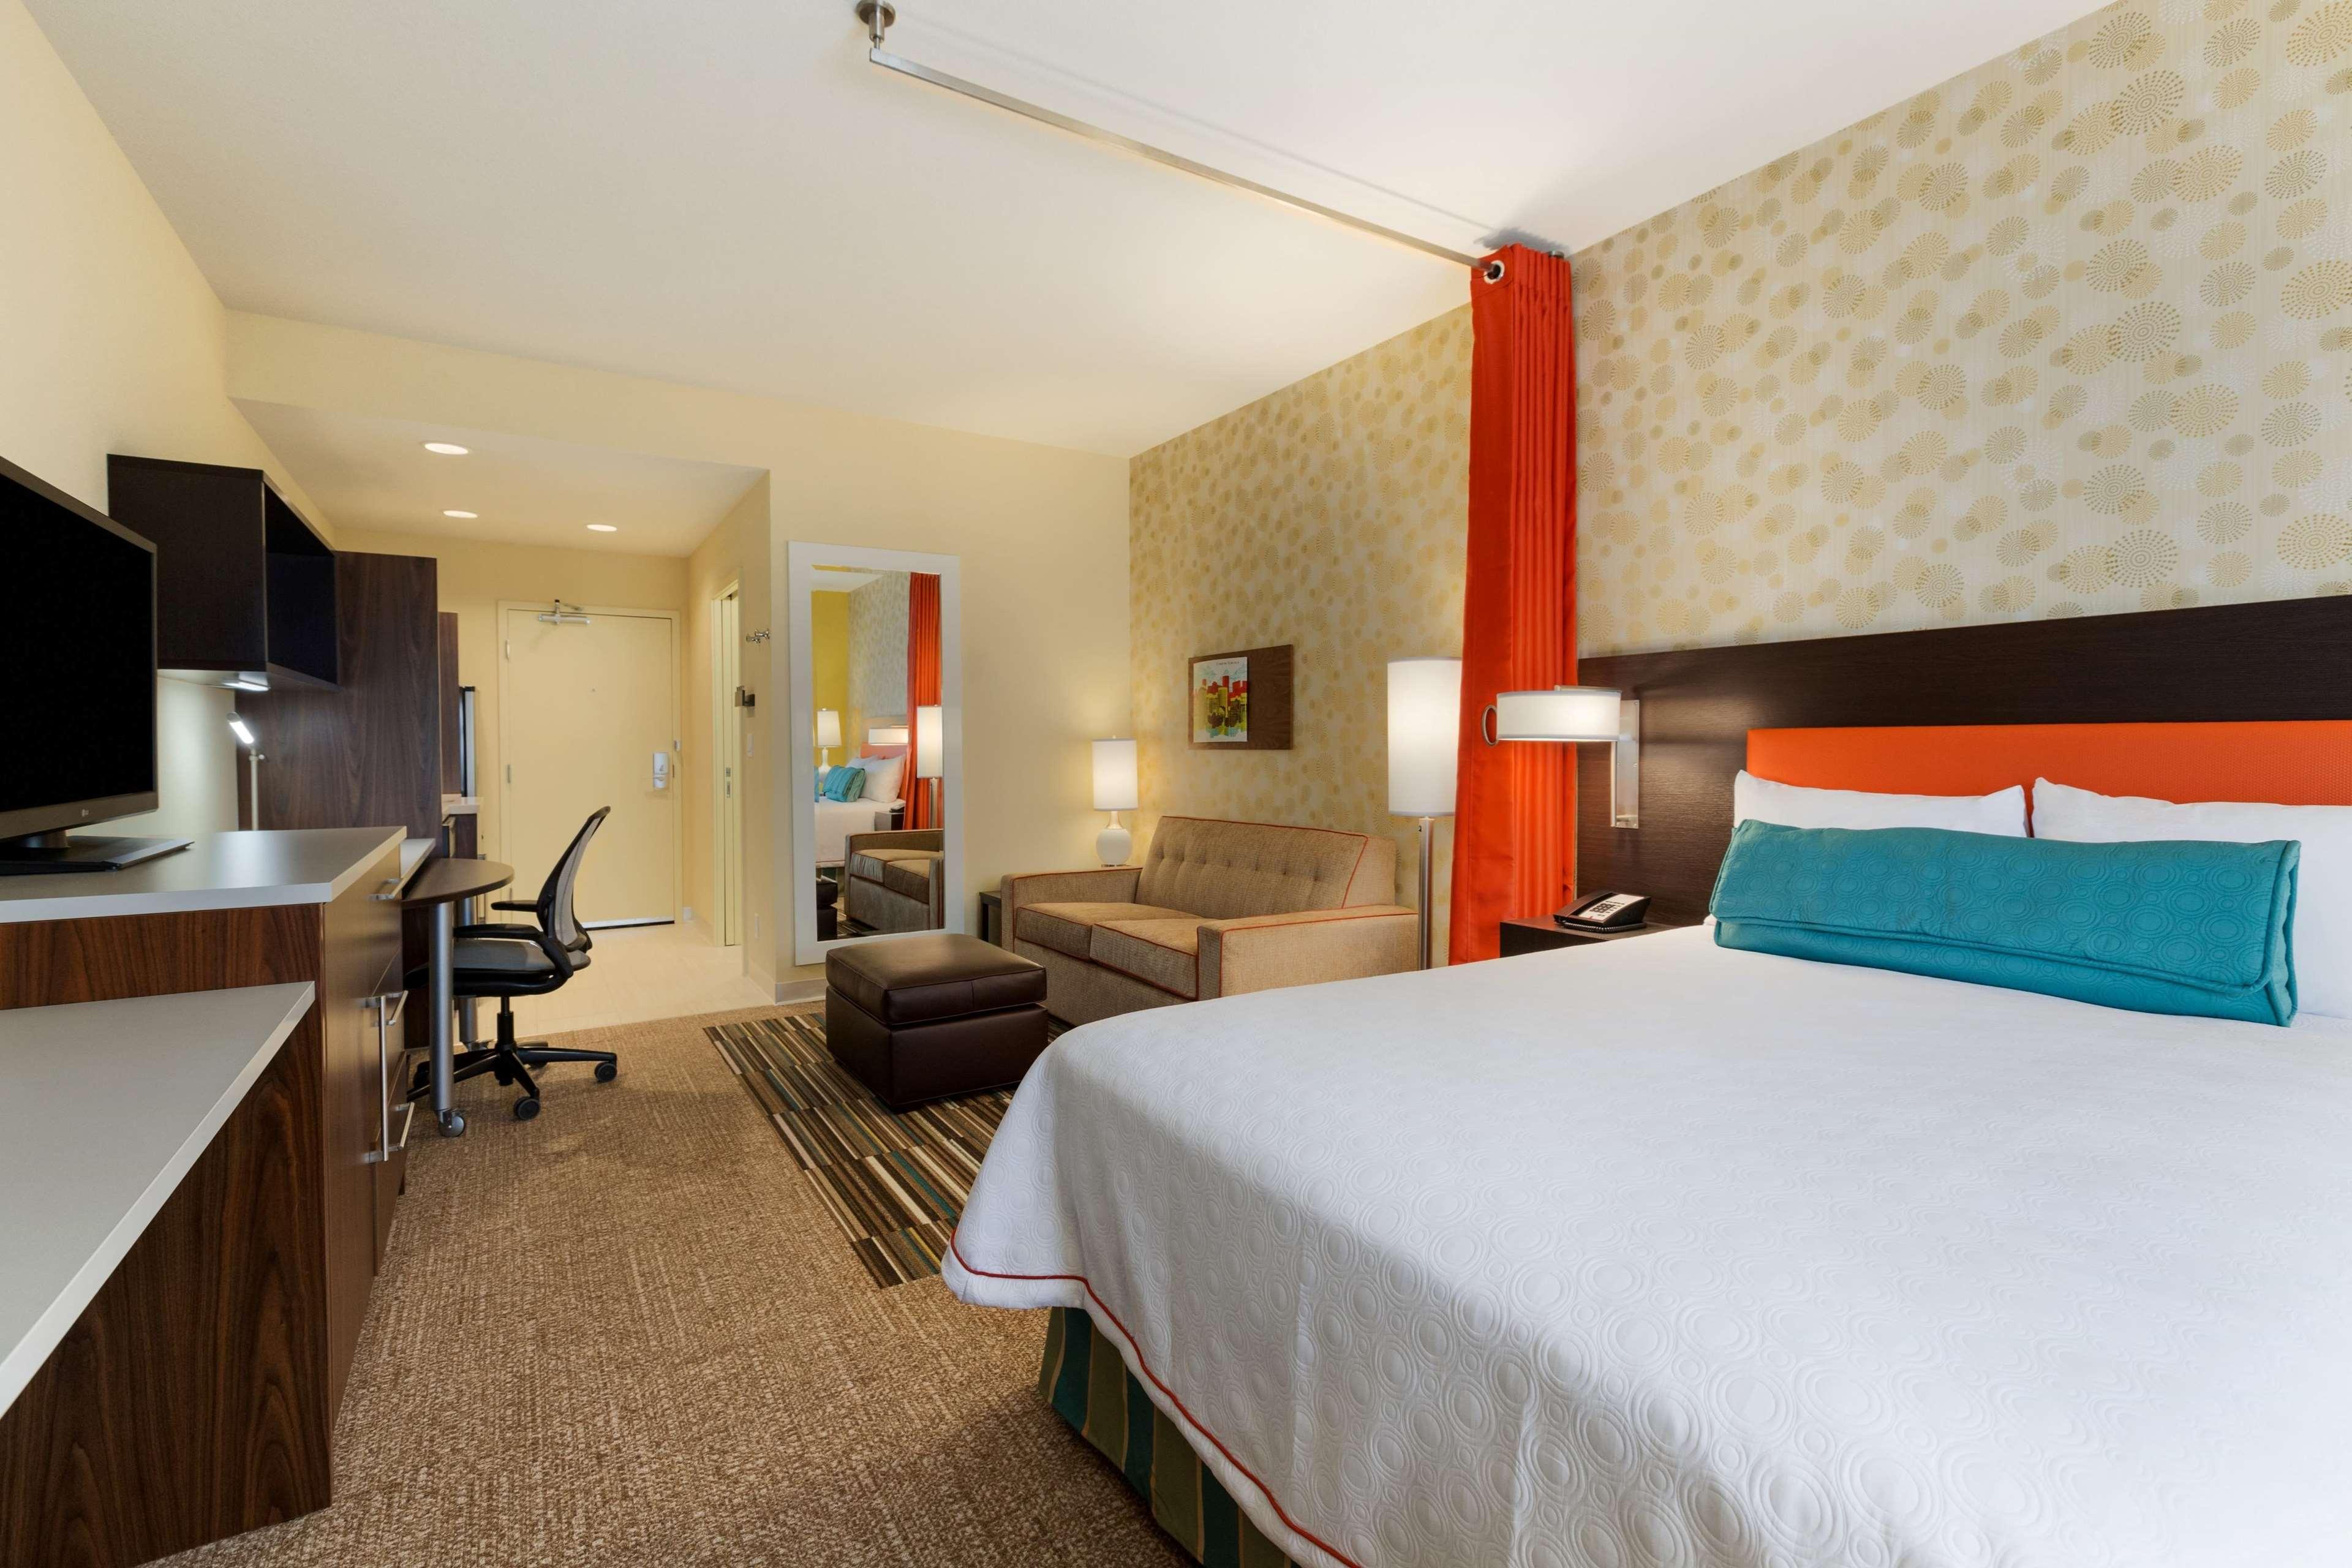 Home2 Suites by Hilton West Edmonton, Alberta, Canada à Edmonton: 1 Queen Studio Suite Room